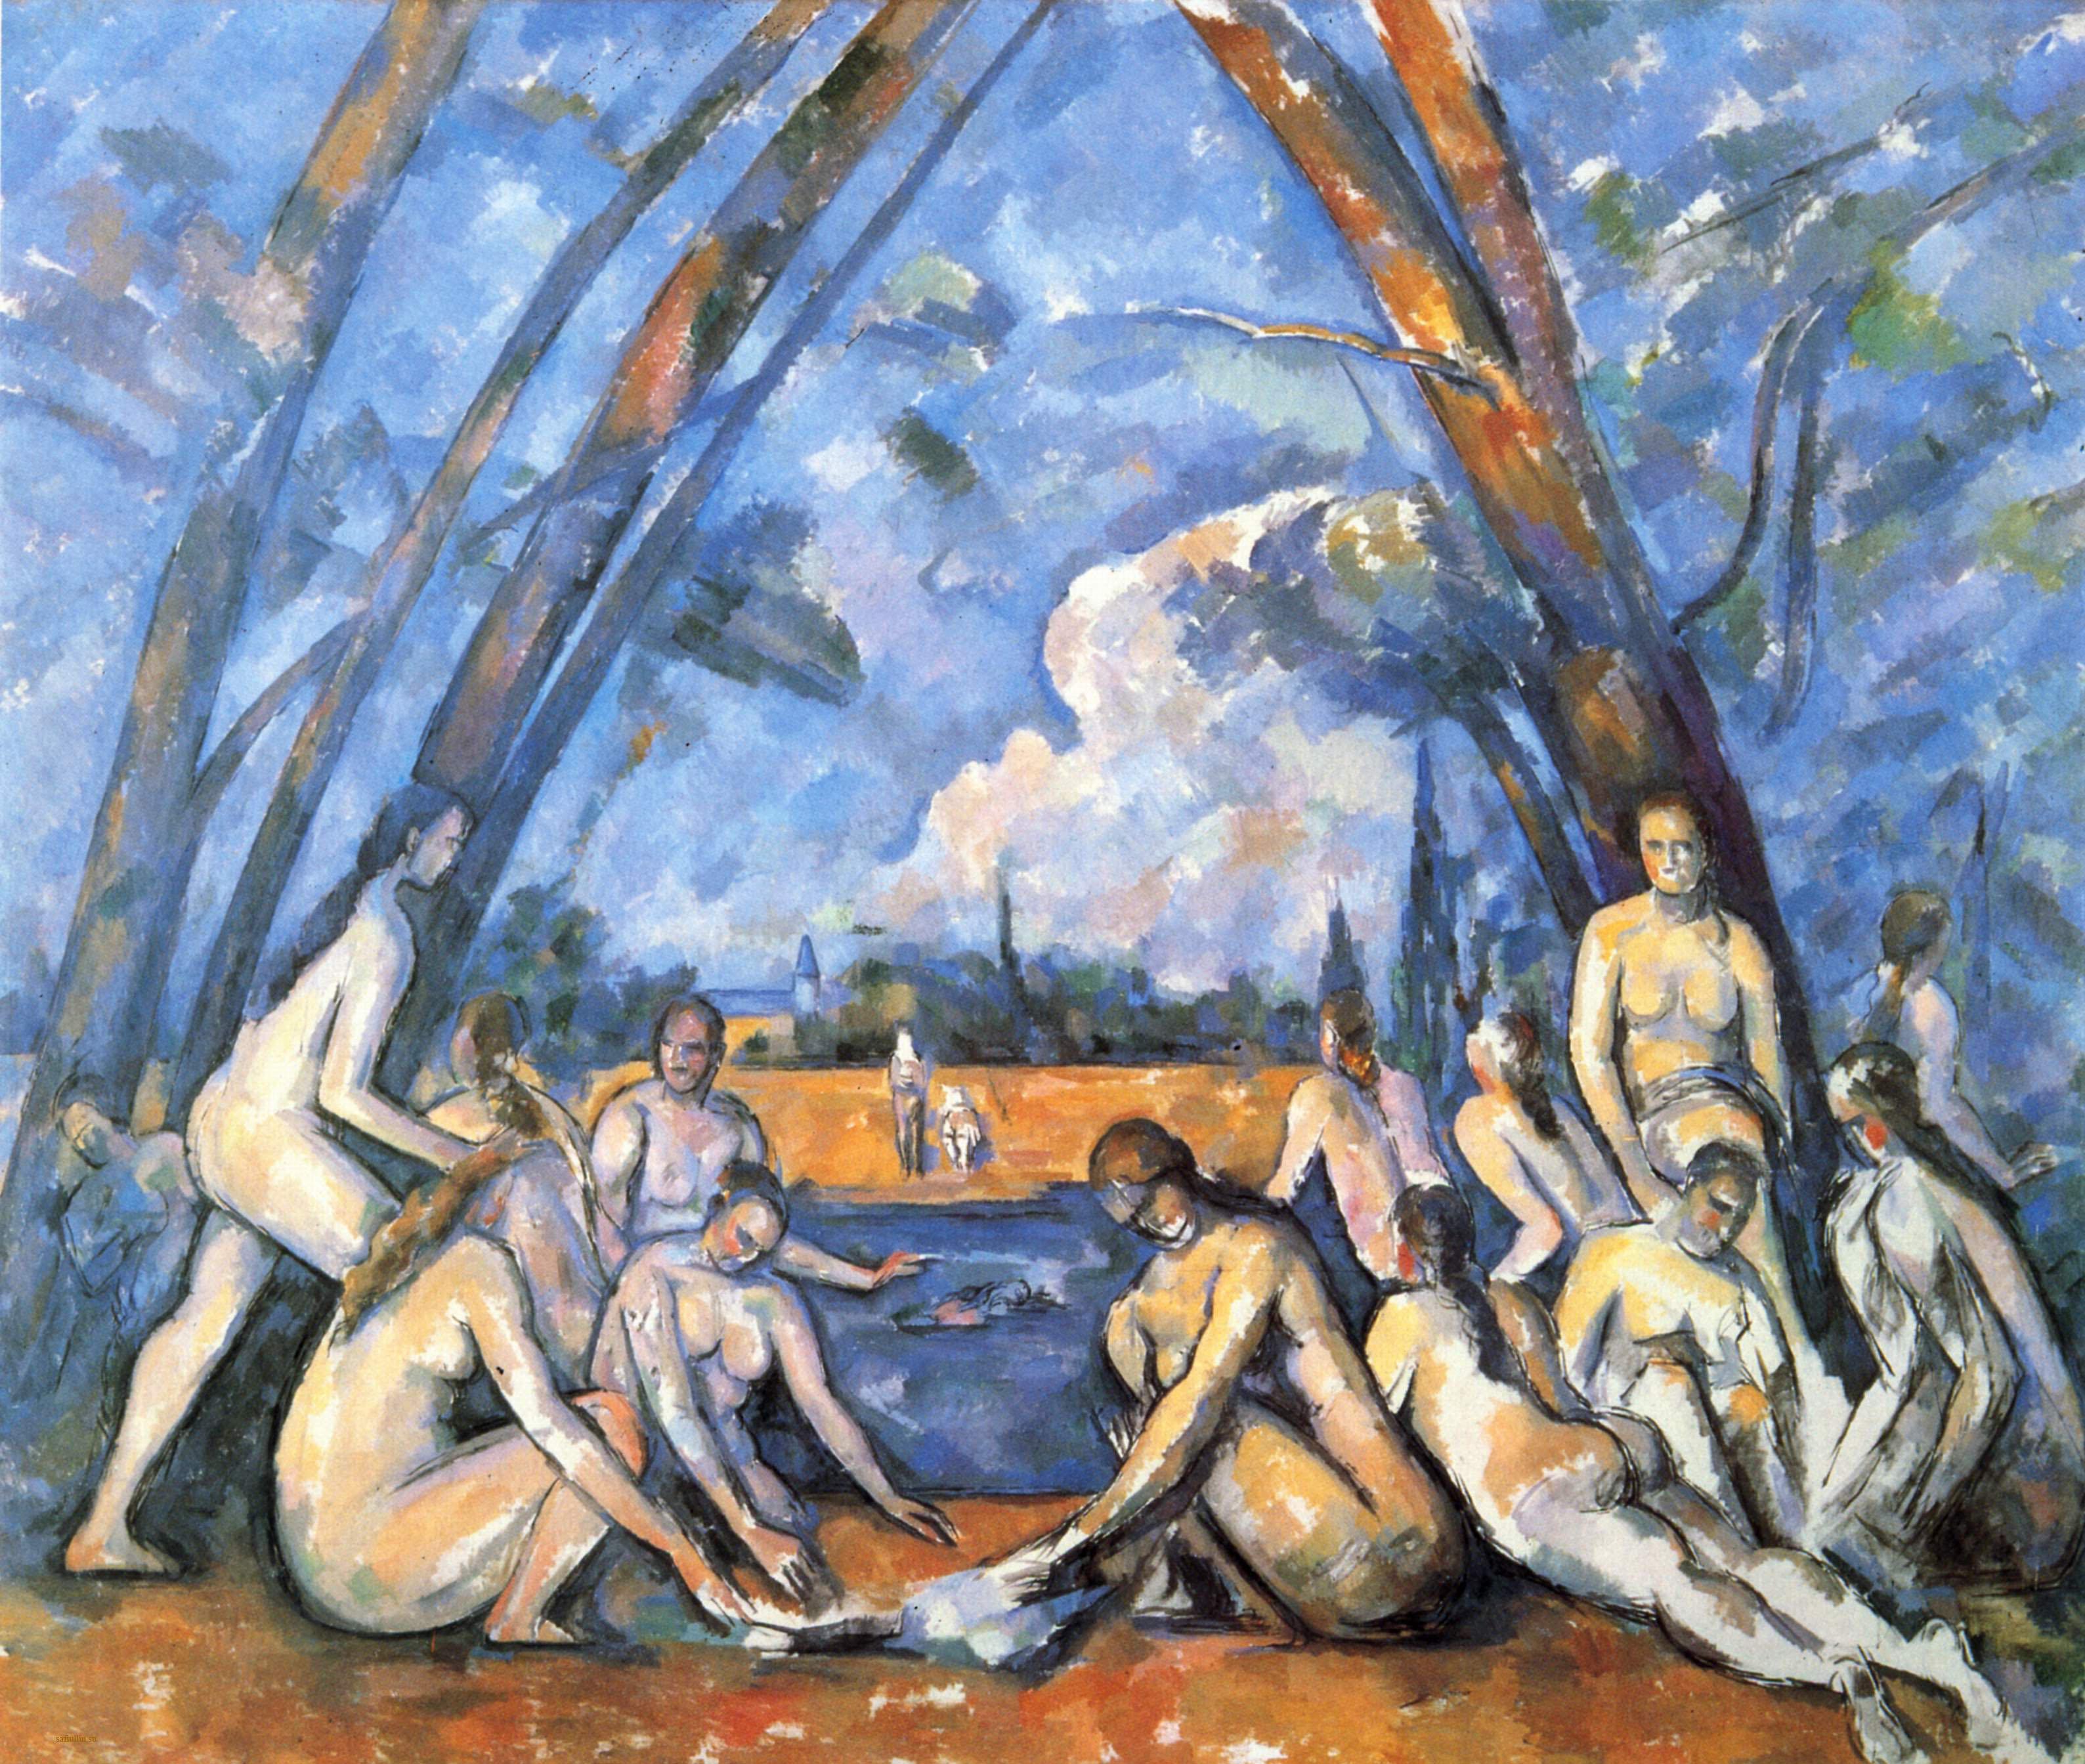 Сезанн картина Купальщицы Сент-Виктуар пейзажи природы Альберт Сафиуллин